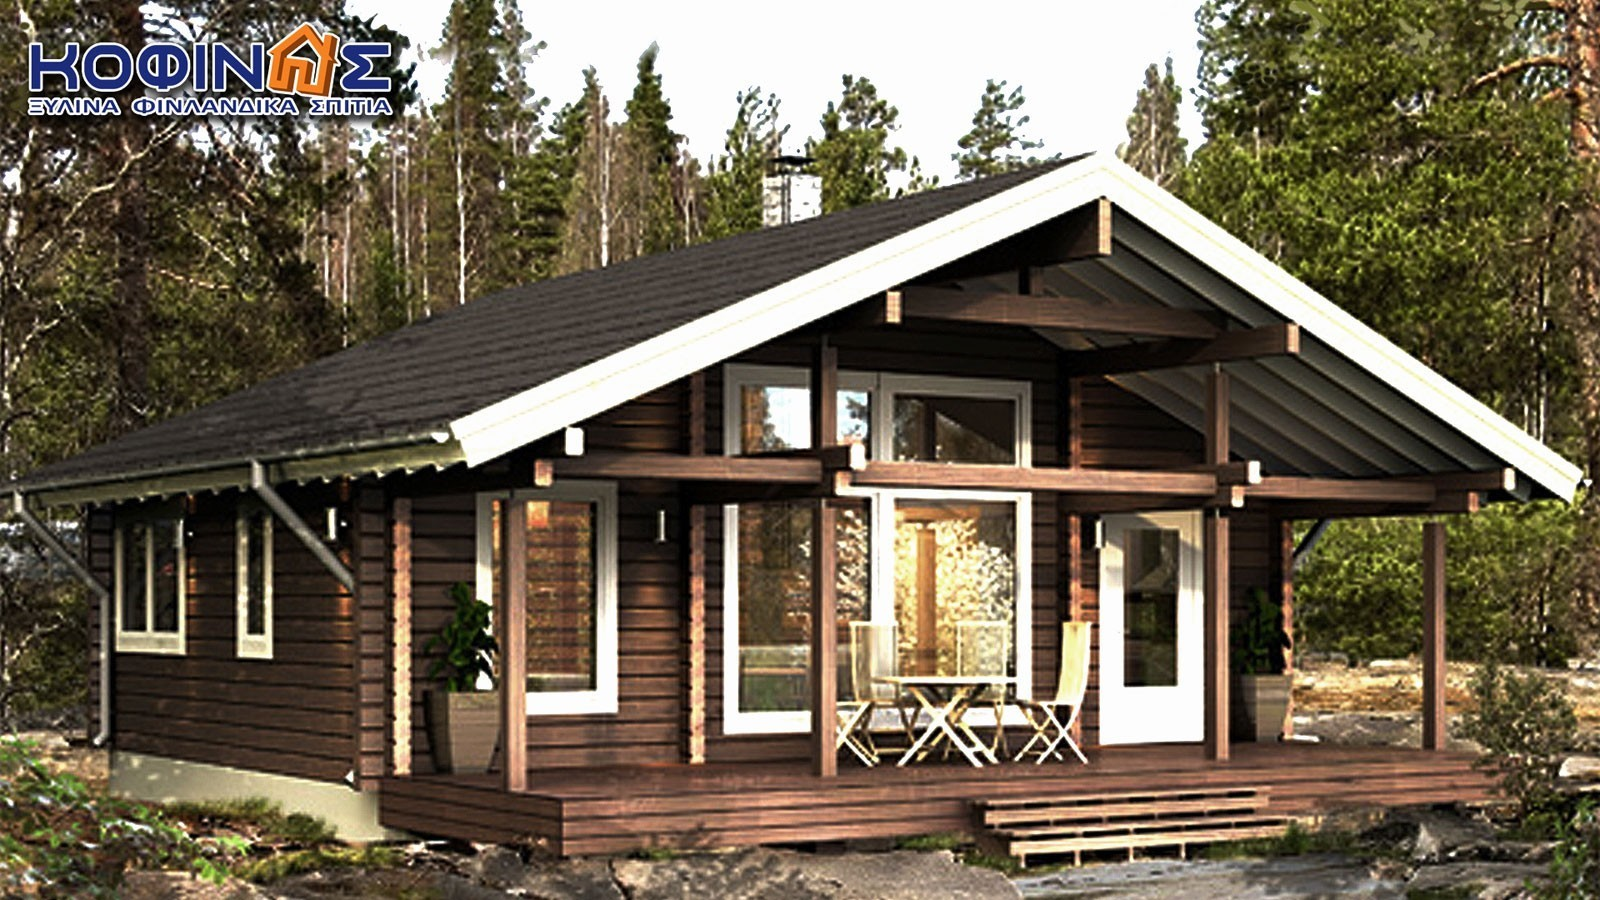 a4aef3e60c5a Σχέδια Για Ισόγεια Ξύλινα Σπίτια